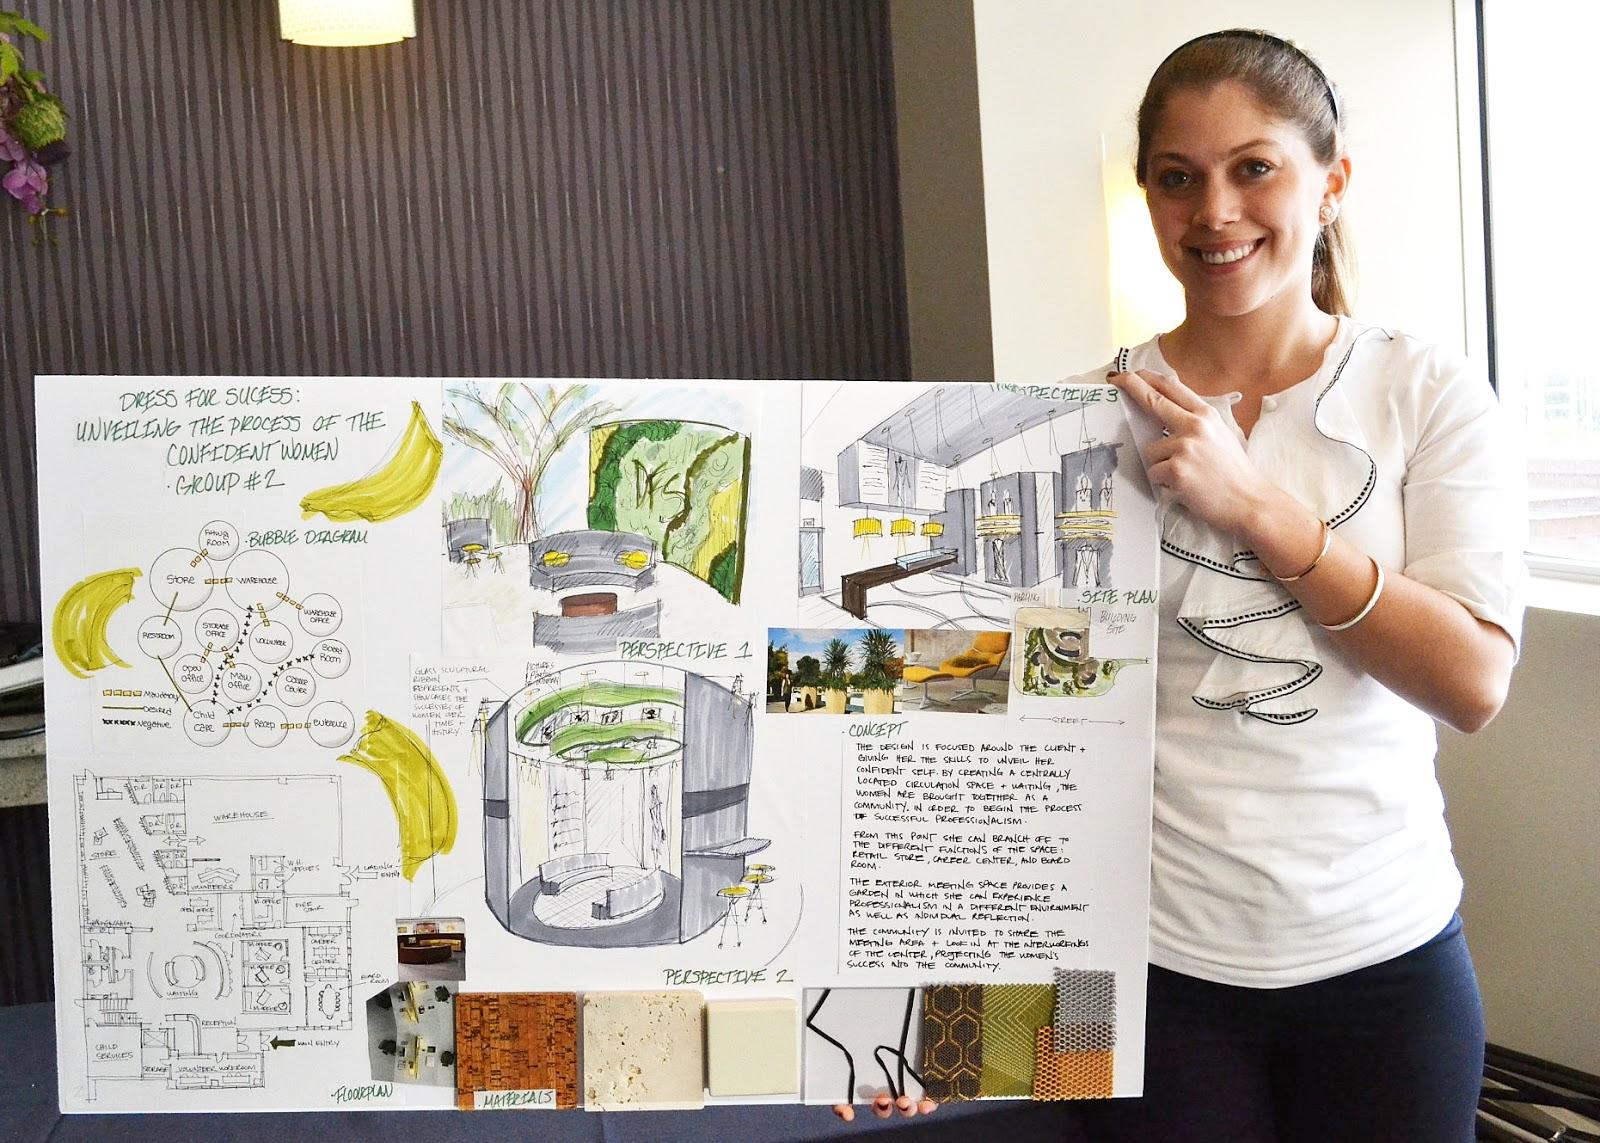 interior design blog february 2013 On student interior decorator